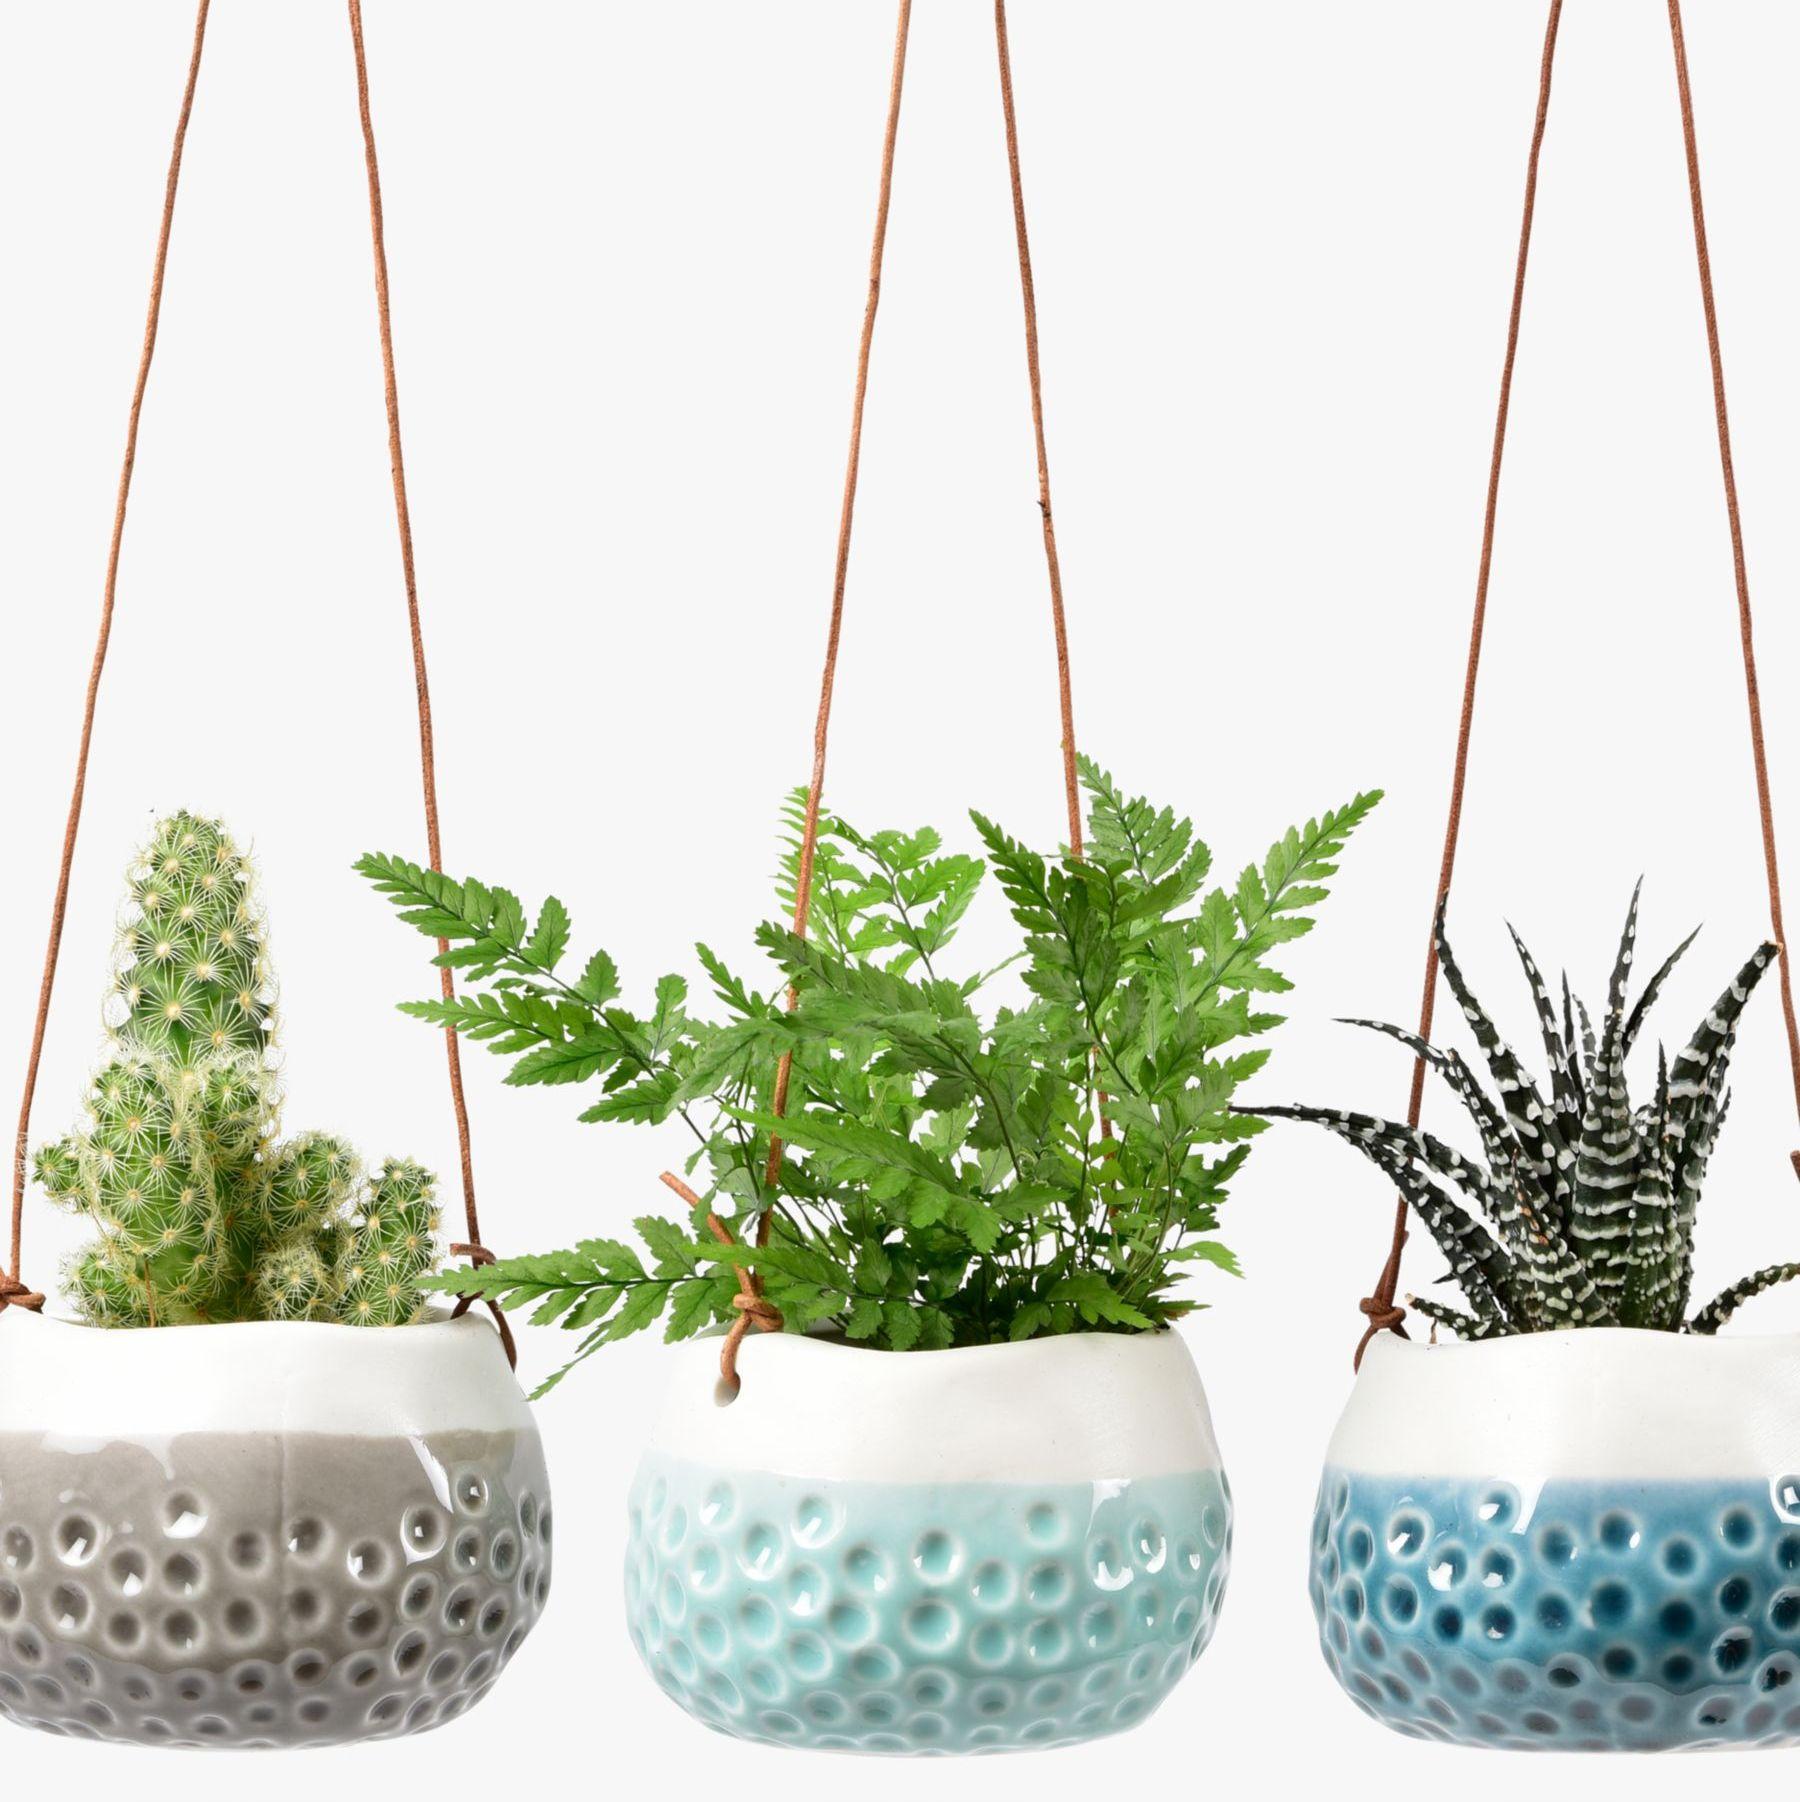 Succulent planter Wall planter Plant pot Plant hanger Hanging ceramic planter Pot for plant Hanging planter indoor Plant holder